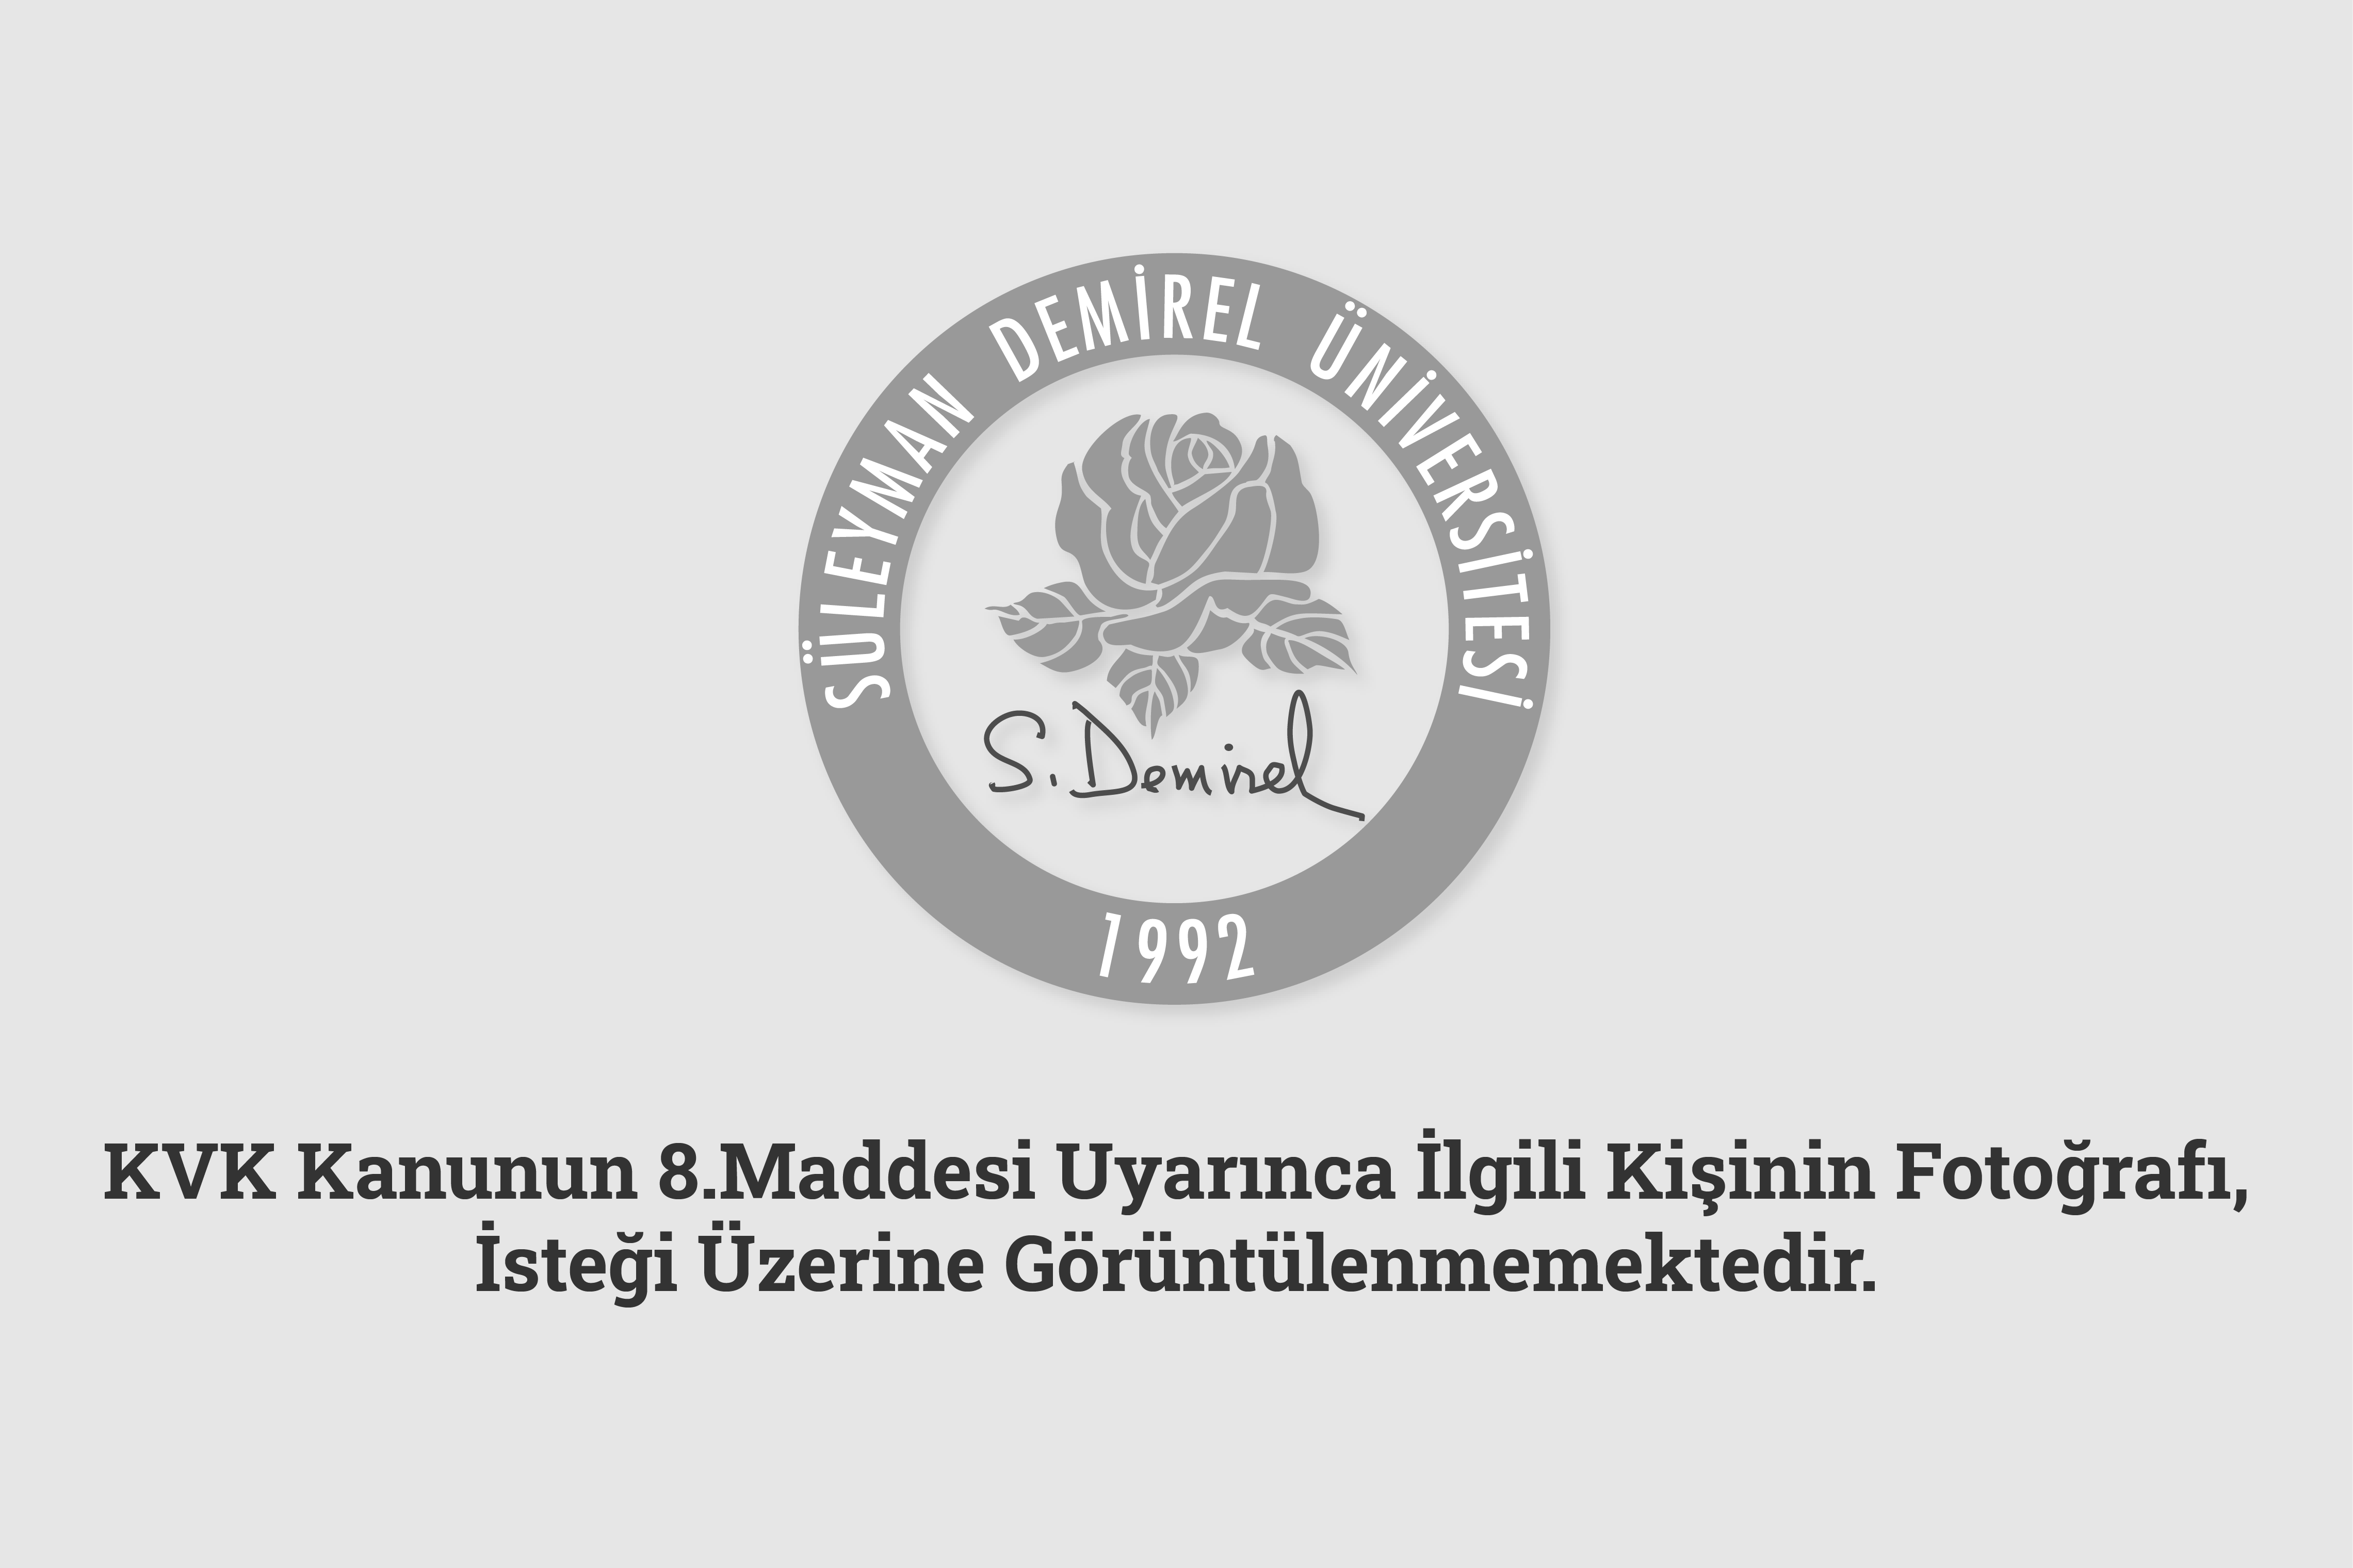 Osman DAĞCI